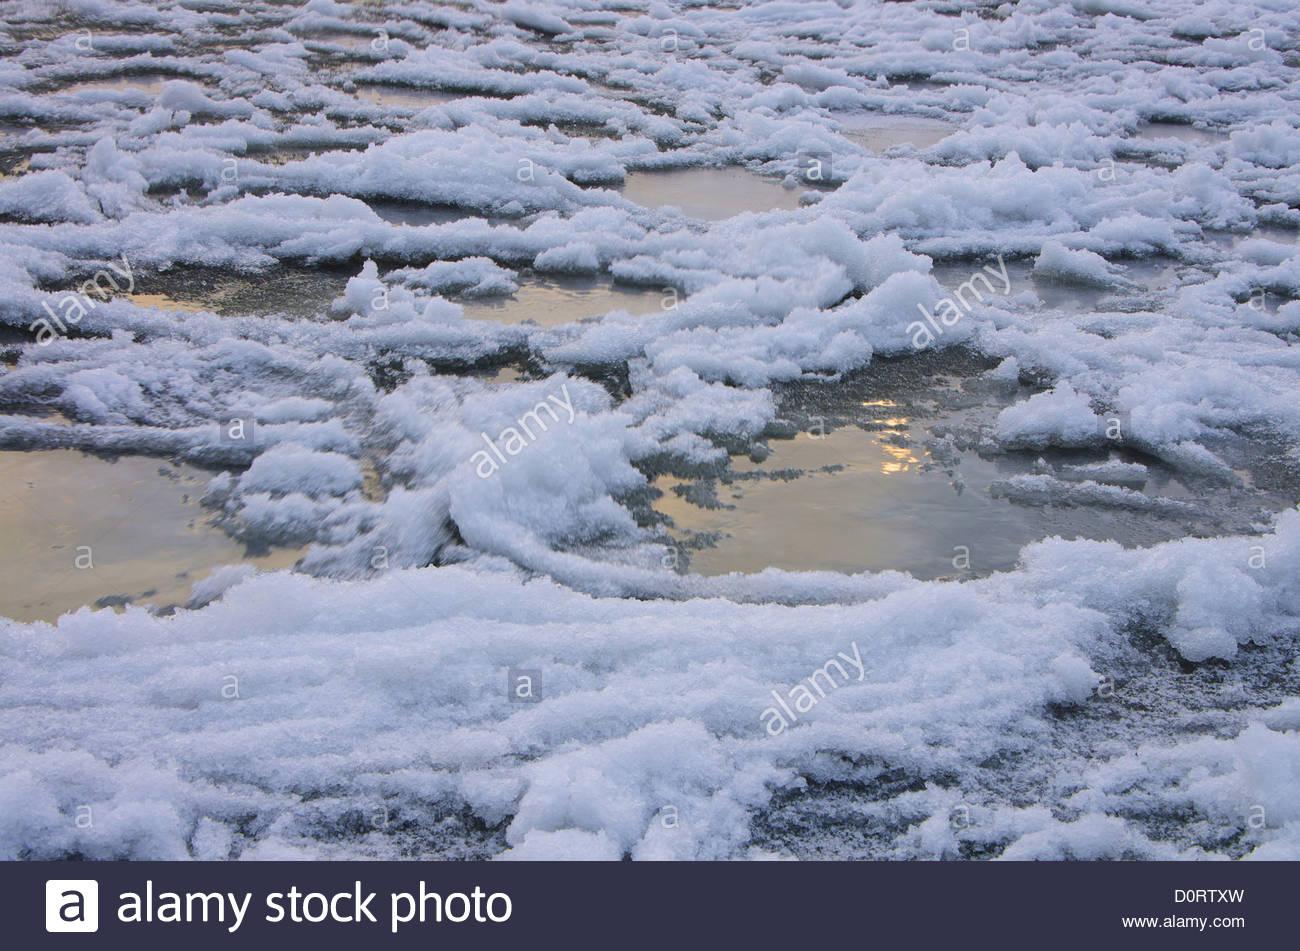 Austria, Vorarlberg, Rhine delta, Rhine, River, Fluss, Lake Constance, lake, winter, morning, fog, ice - Stock Image